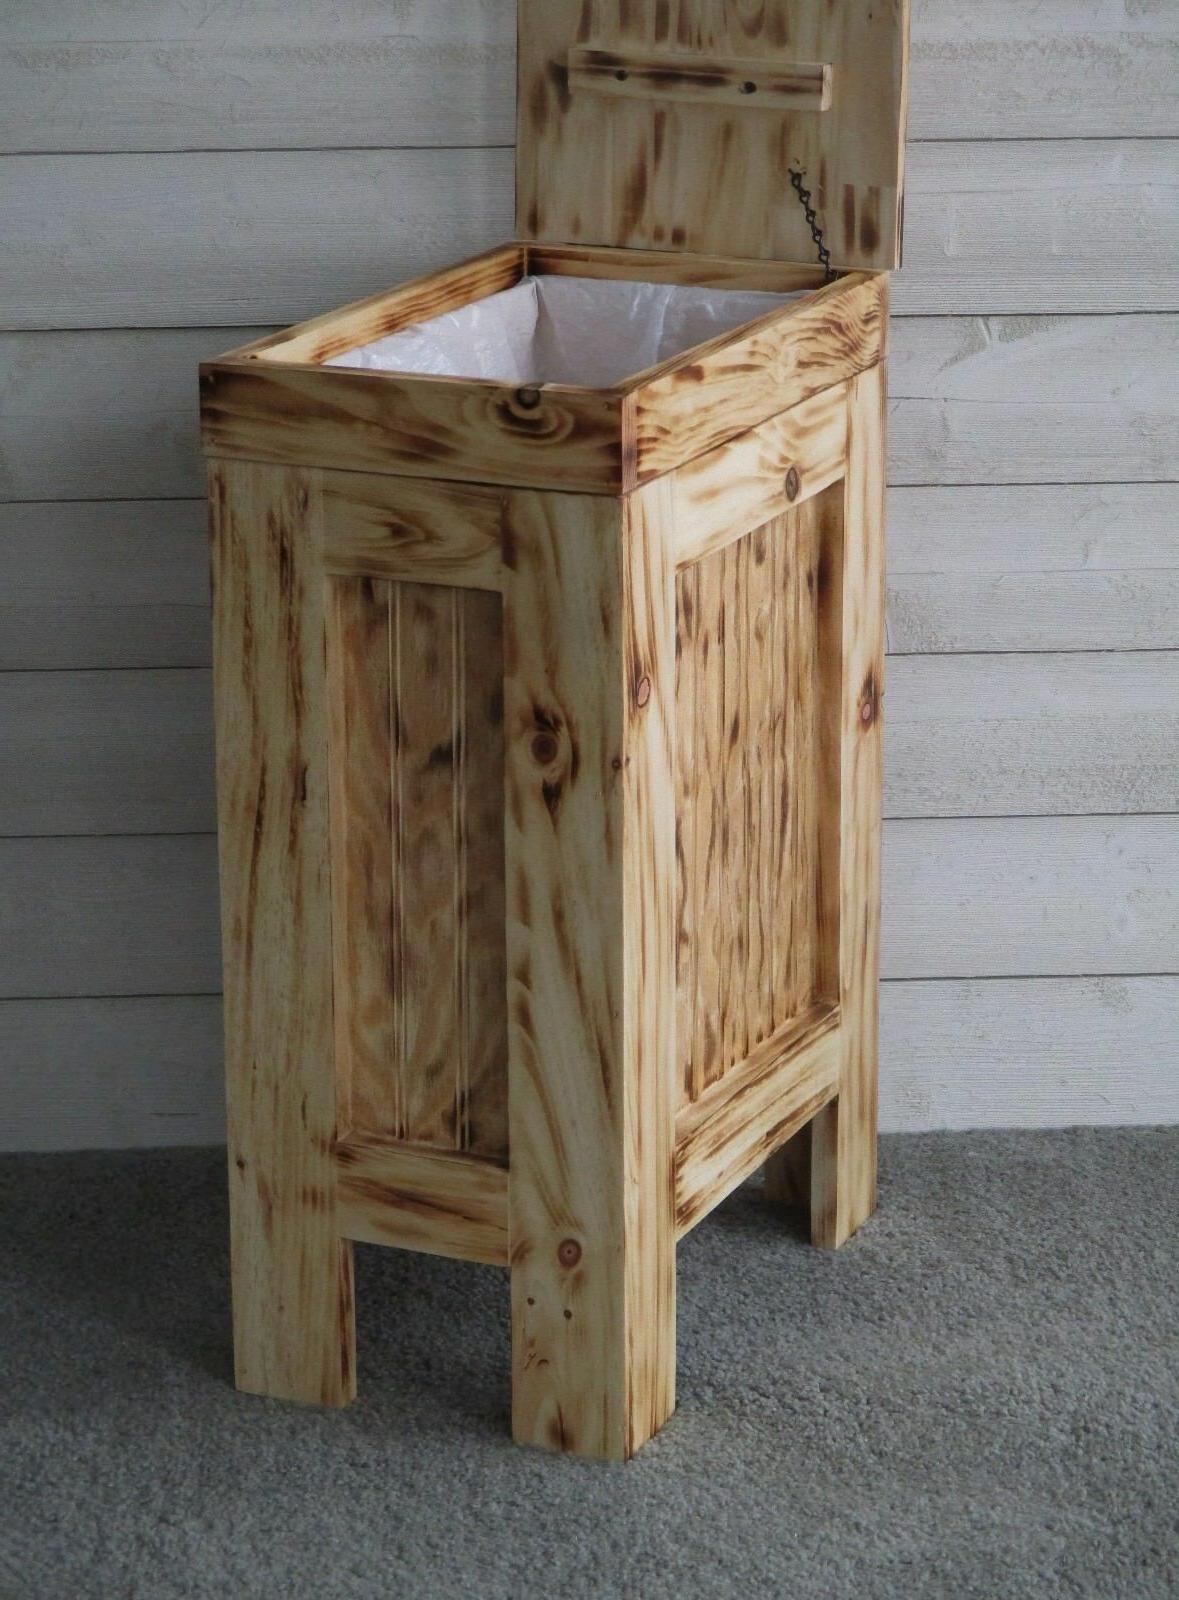 Wood Can Kitchen Garbage Can Rustic Wood Trash Bin ROPE